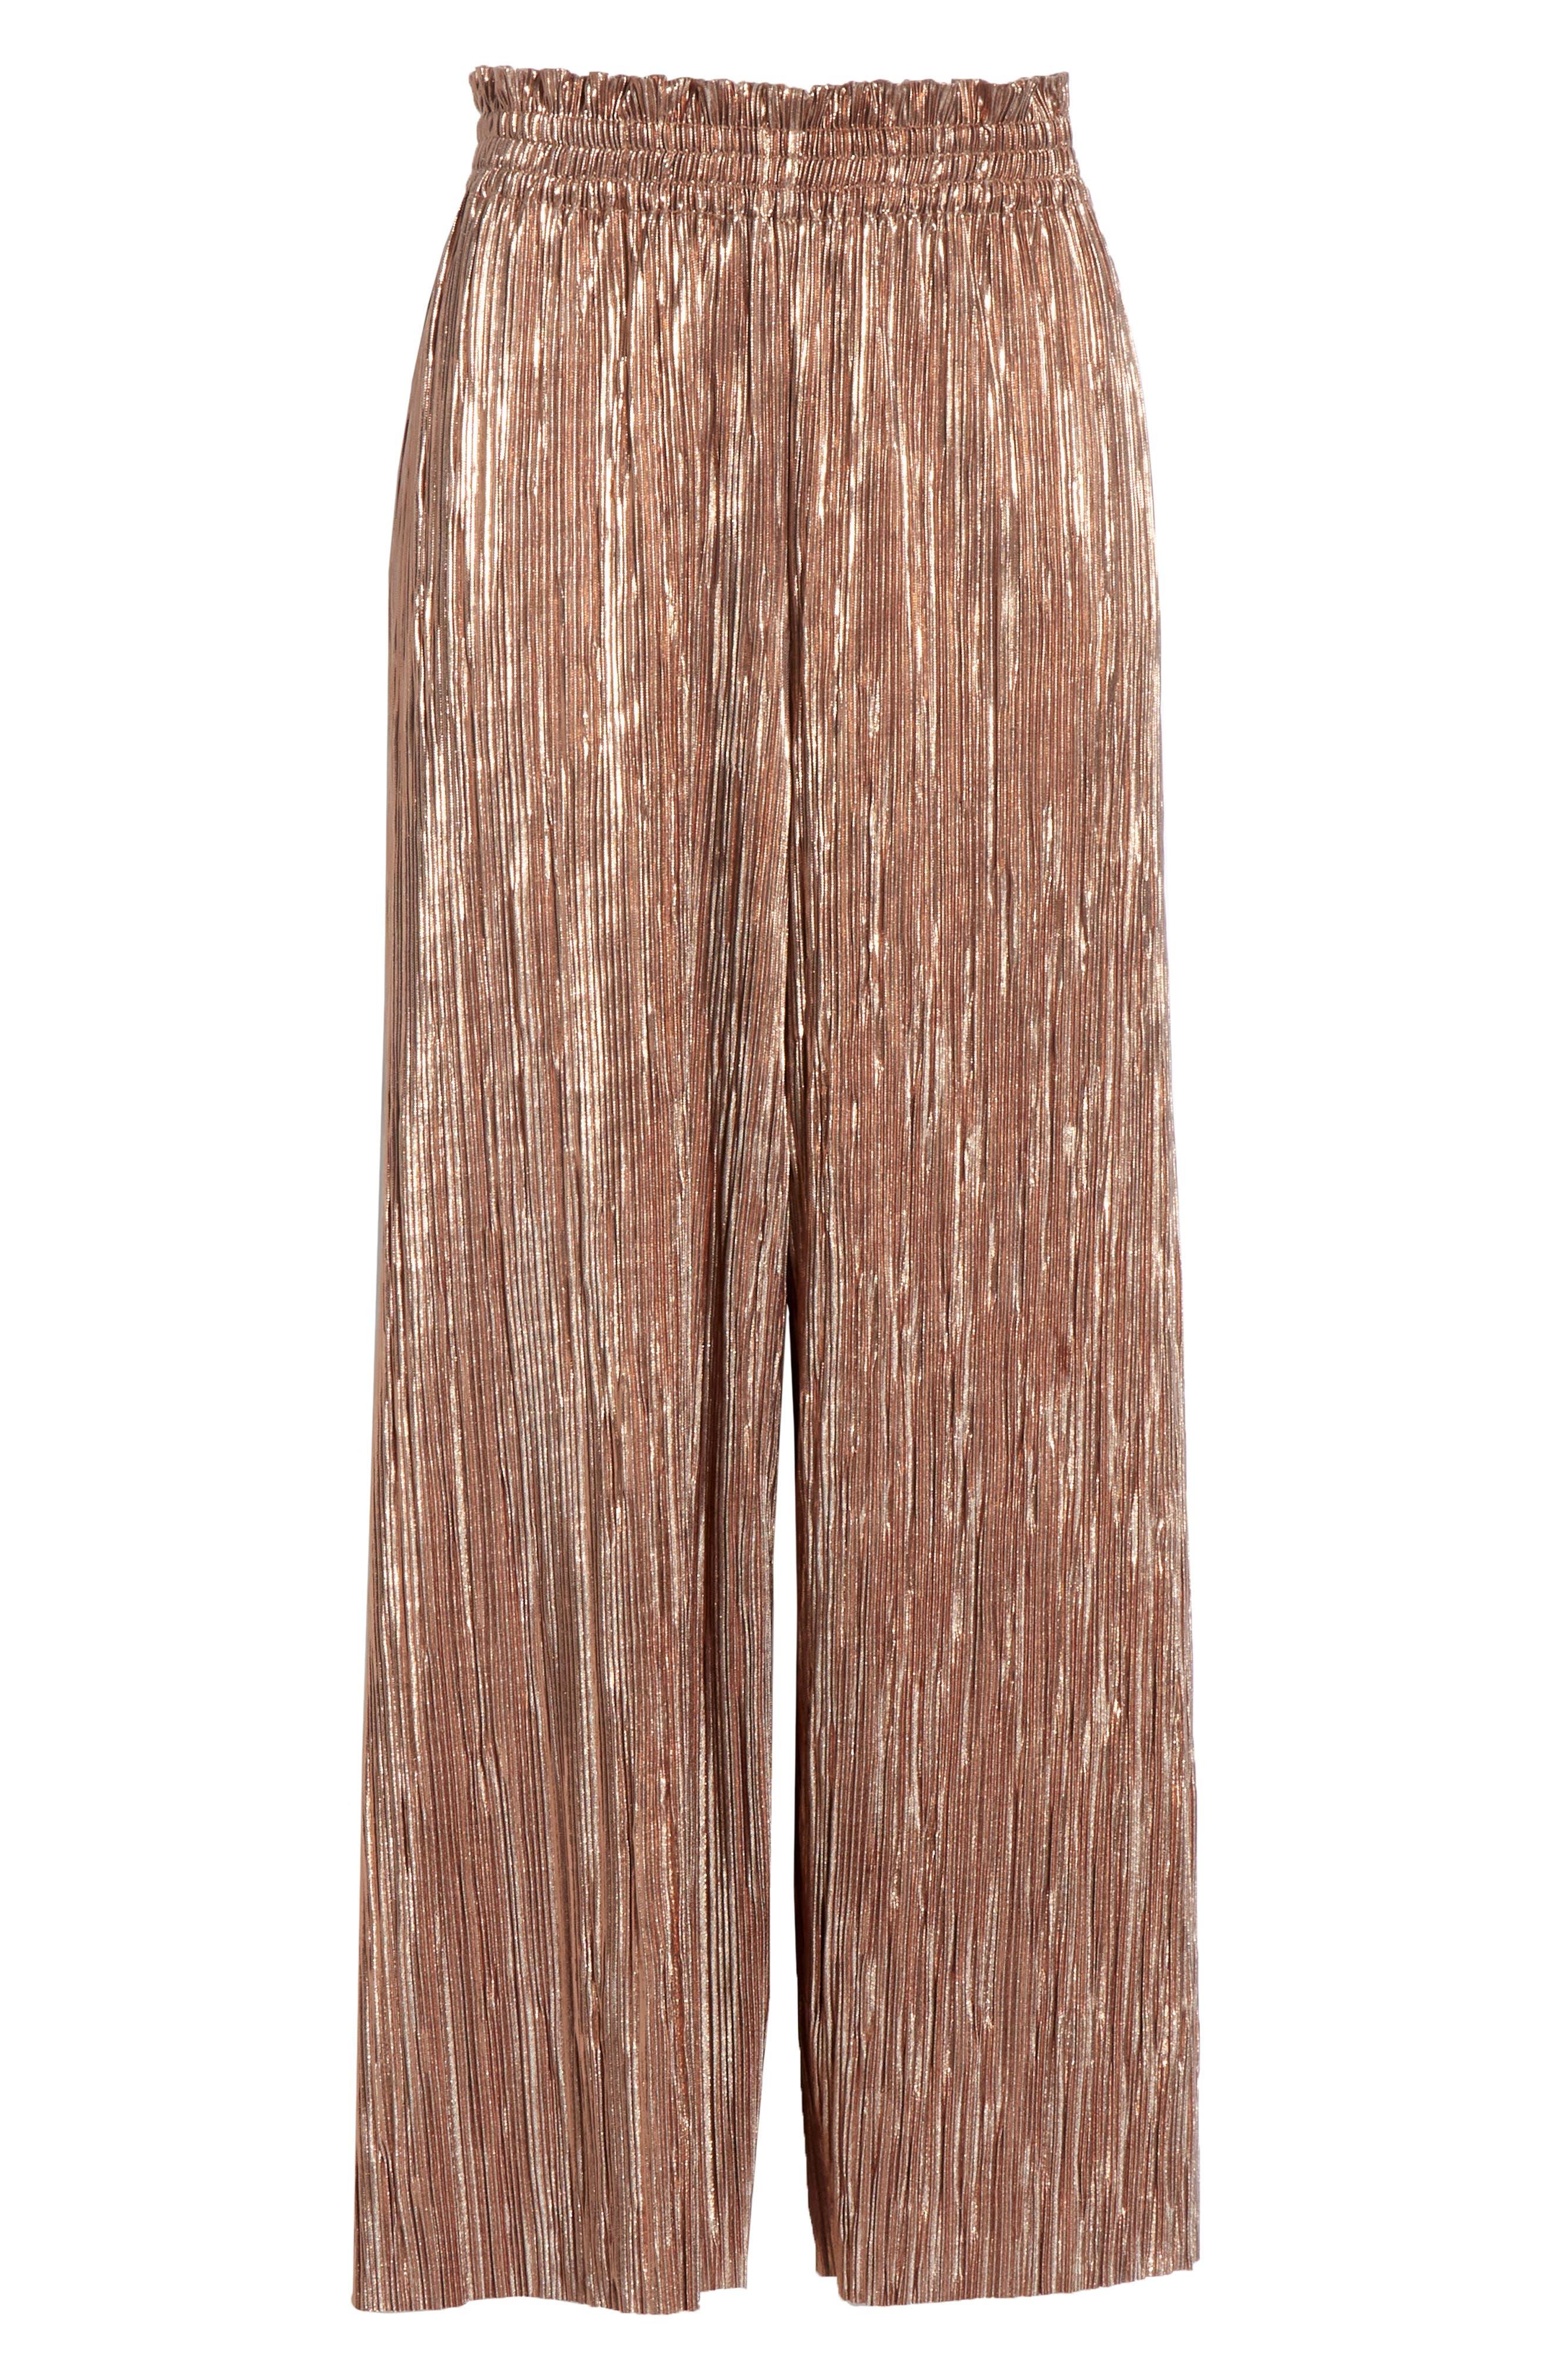 Elba Paperbag Waist Crop Pants,                             Alternate thumbnail 6, color,                             ROSE GOLD